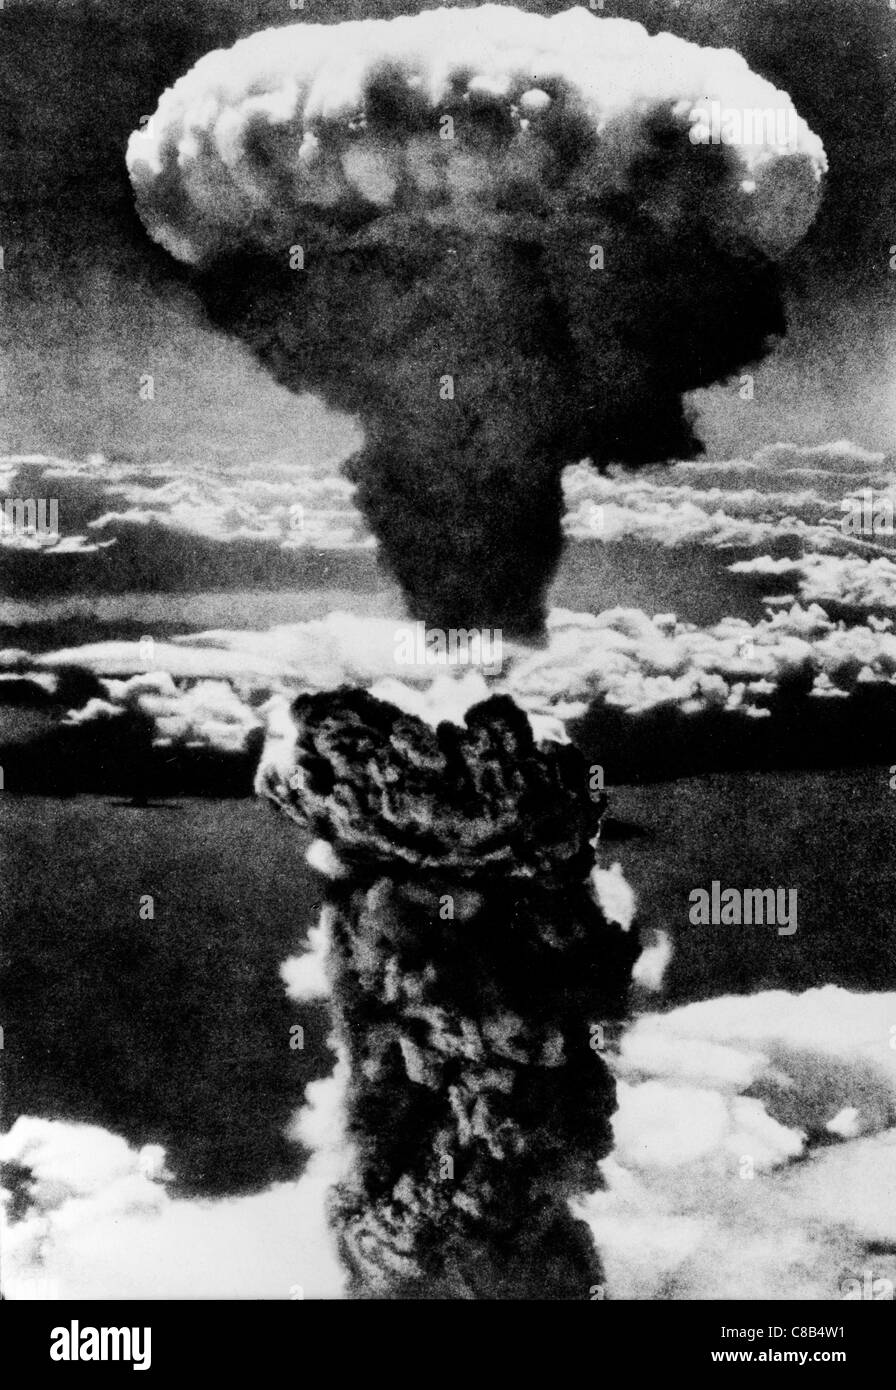 Explosion atomique à Hiroshima,1945 Photo Stock